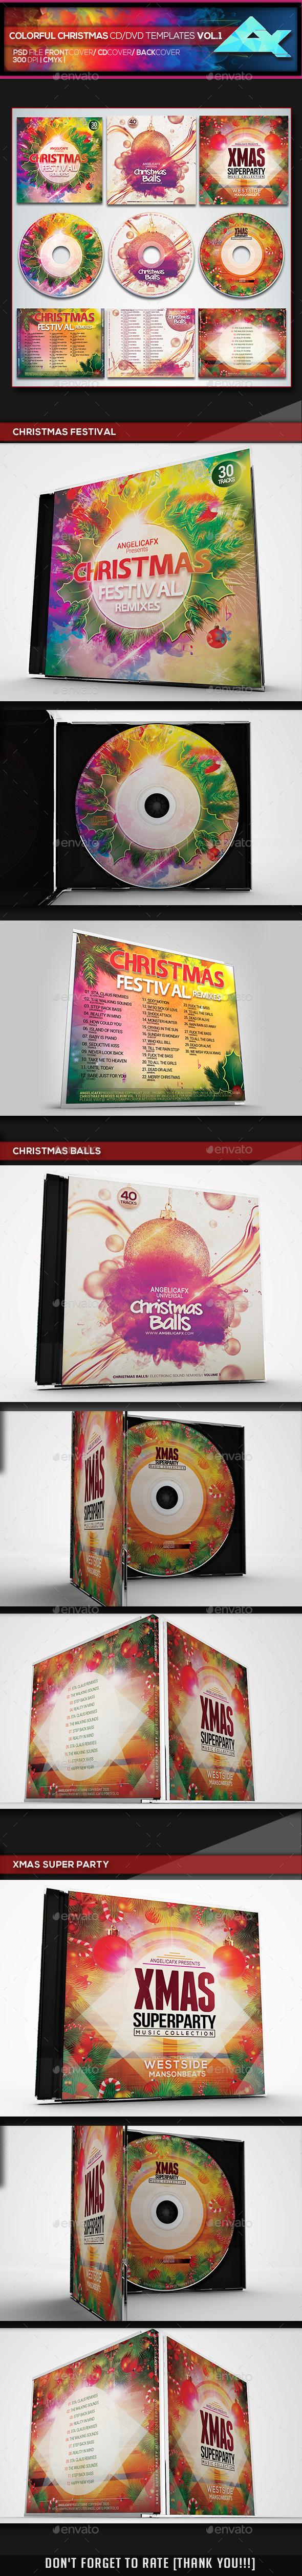 Colorful Christmas CD/DVD Album Covers Bundle Vol. 1 - CD & DVD Artwork Print Templates